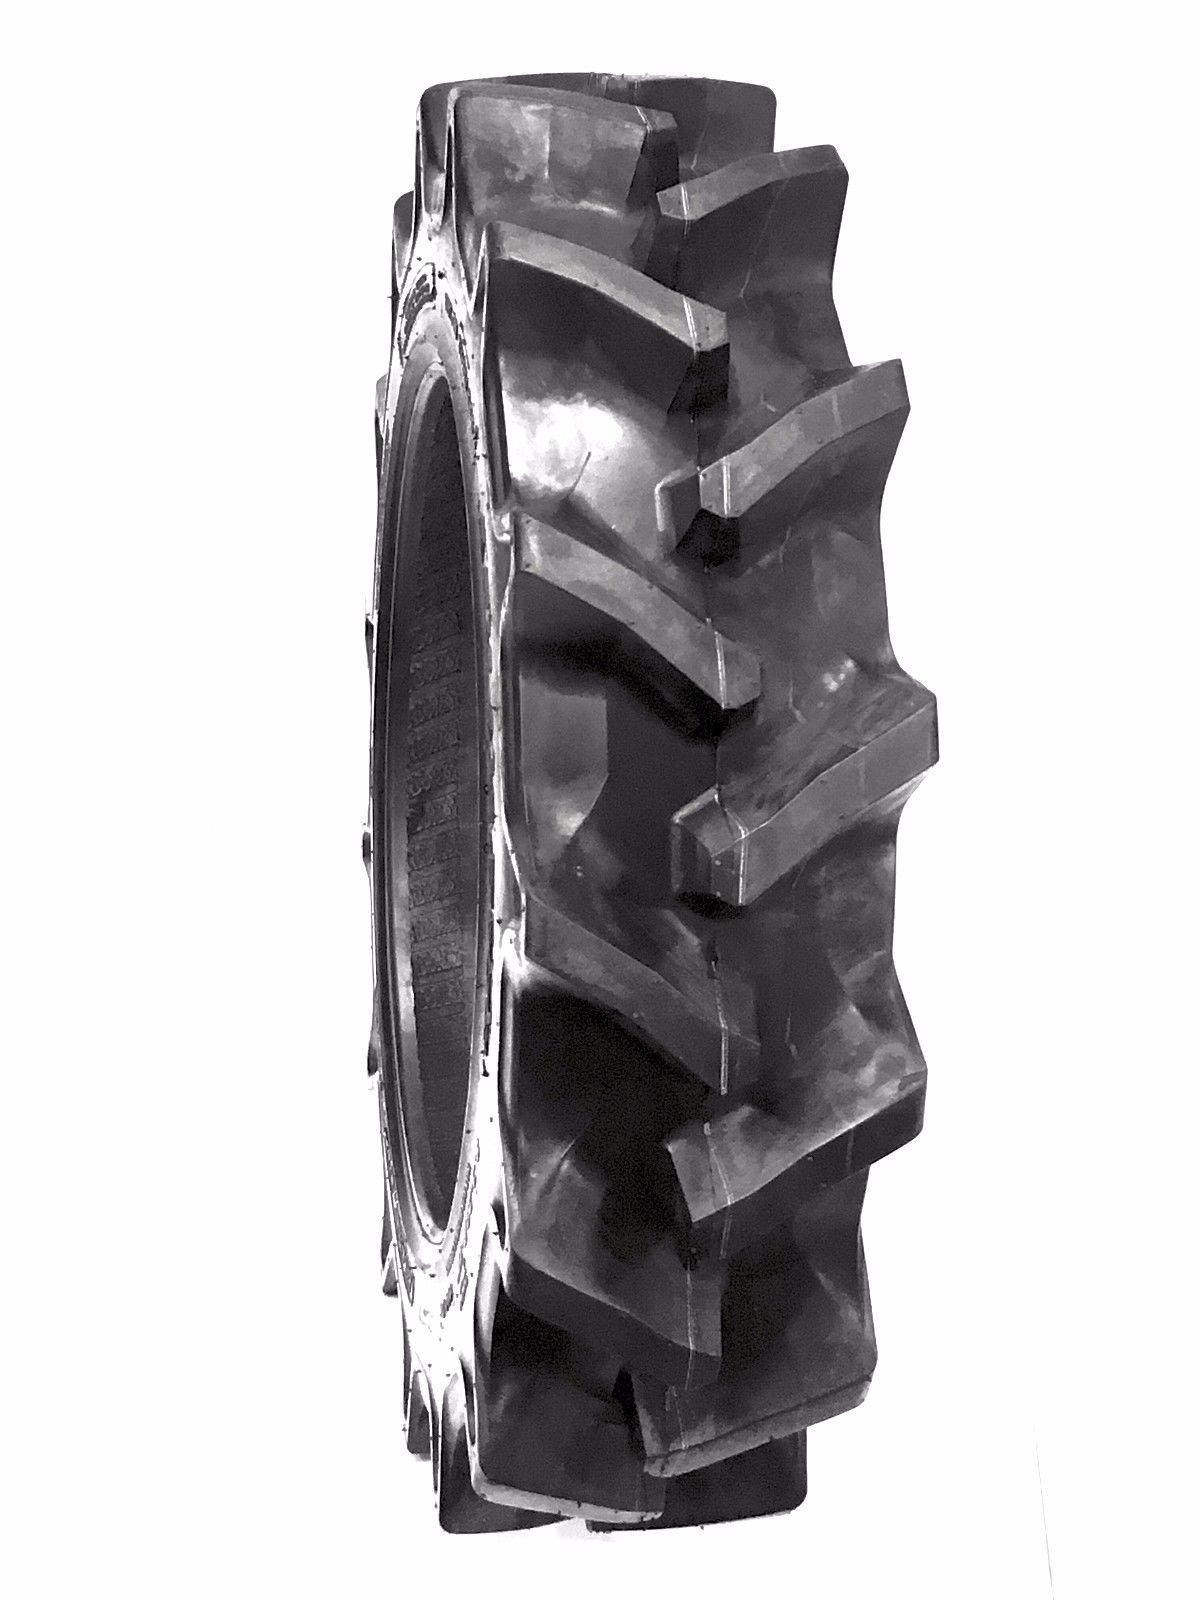 ATV MASTER DEEP TREAD 8.3X20 ATV TIRES 6PLY TUBELESS DEEP LUG TIRES for 20' Wheels